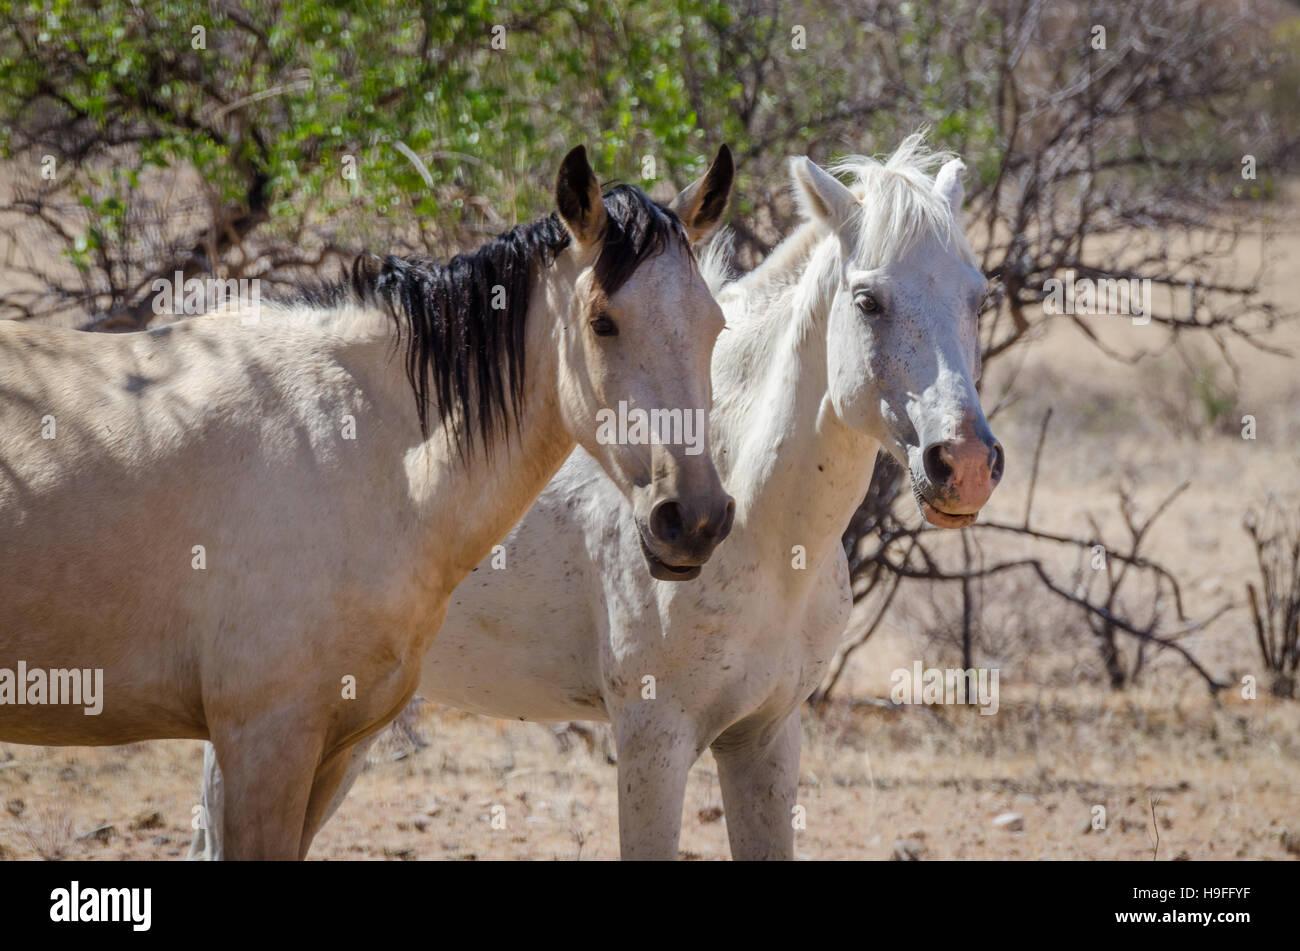 Two wild horses roaming through the Namib Desert of Angola - Stock Image